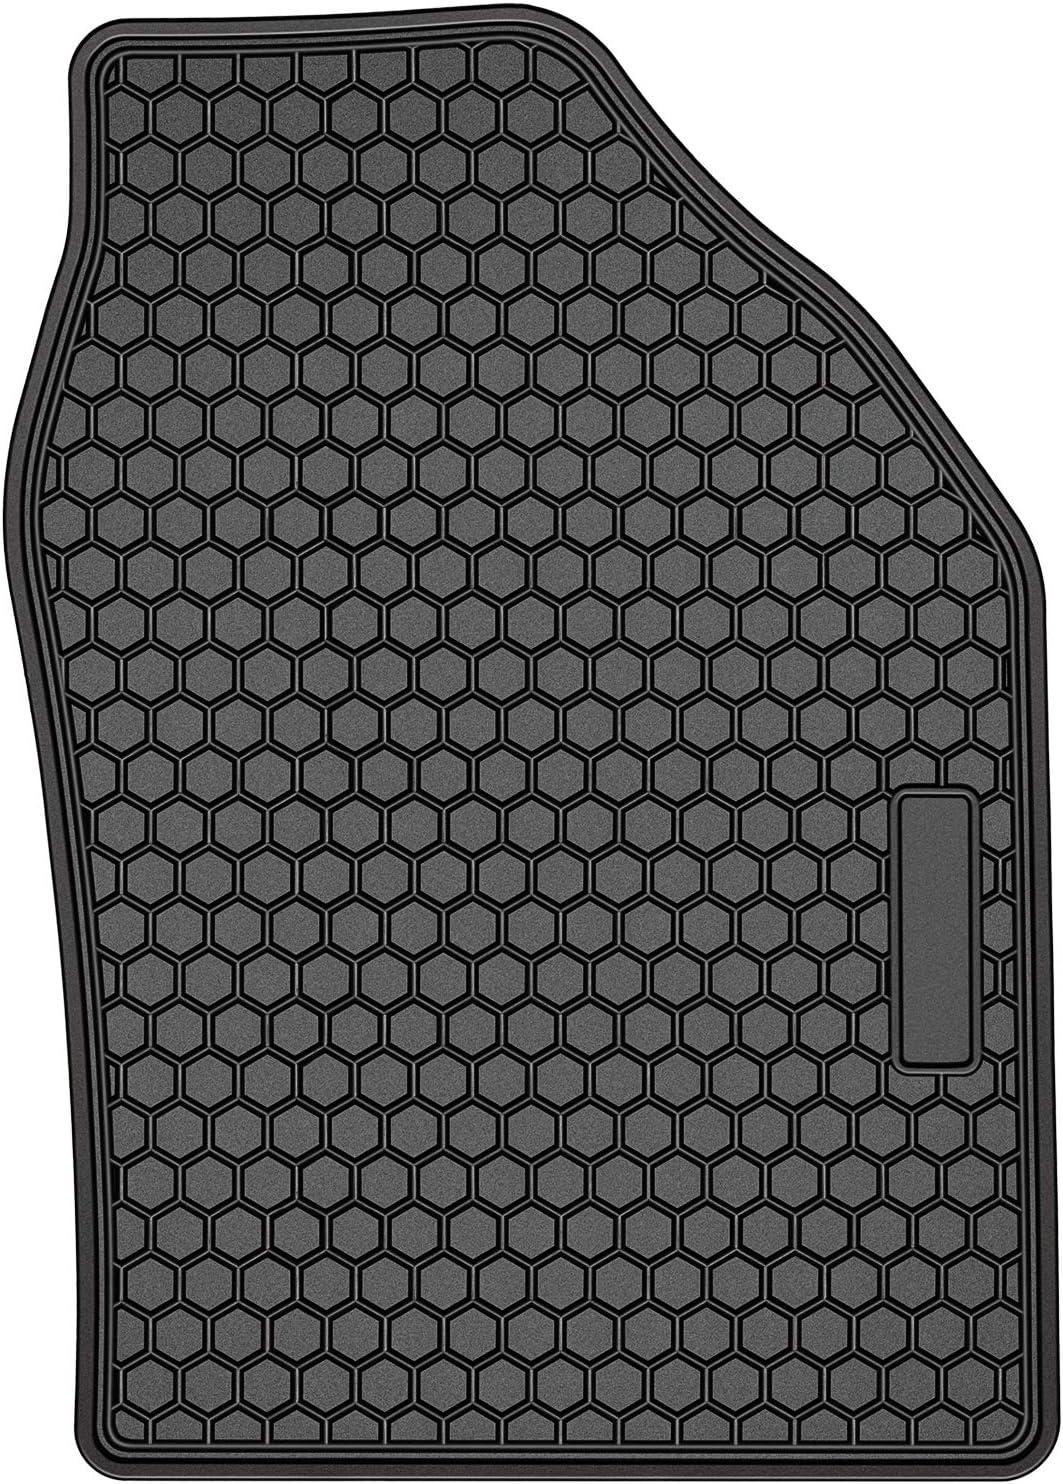 4PCS TeddyTT Floor Mats Compatible with Toyota 4Runner 2019 2018 2017 2016 2015 2014 2013 Heavy Duty Rubber Front/&Rear Car Carpet Waterproof Custom Seasons Odorless All Weather 3D high Edge